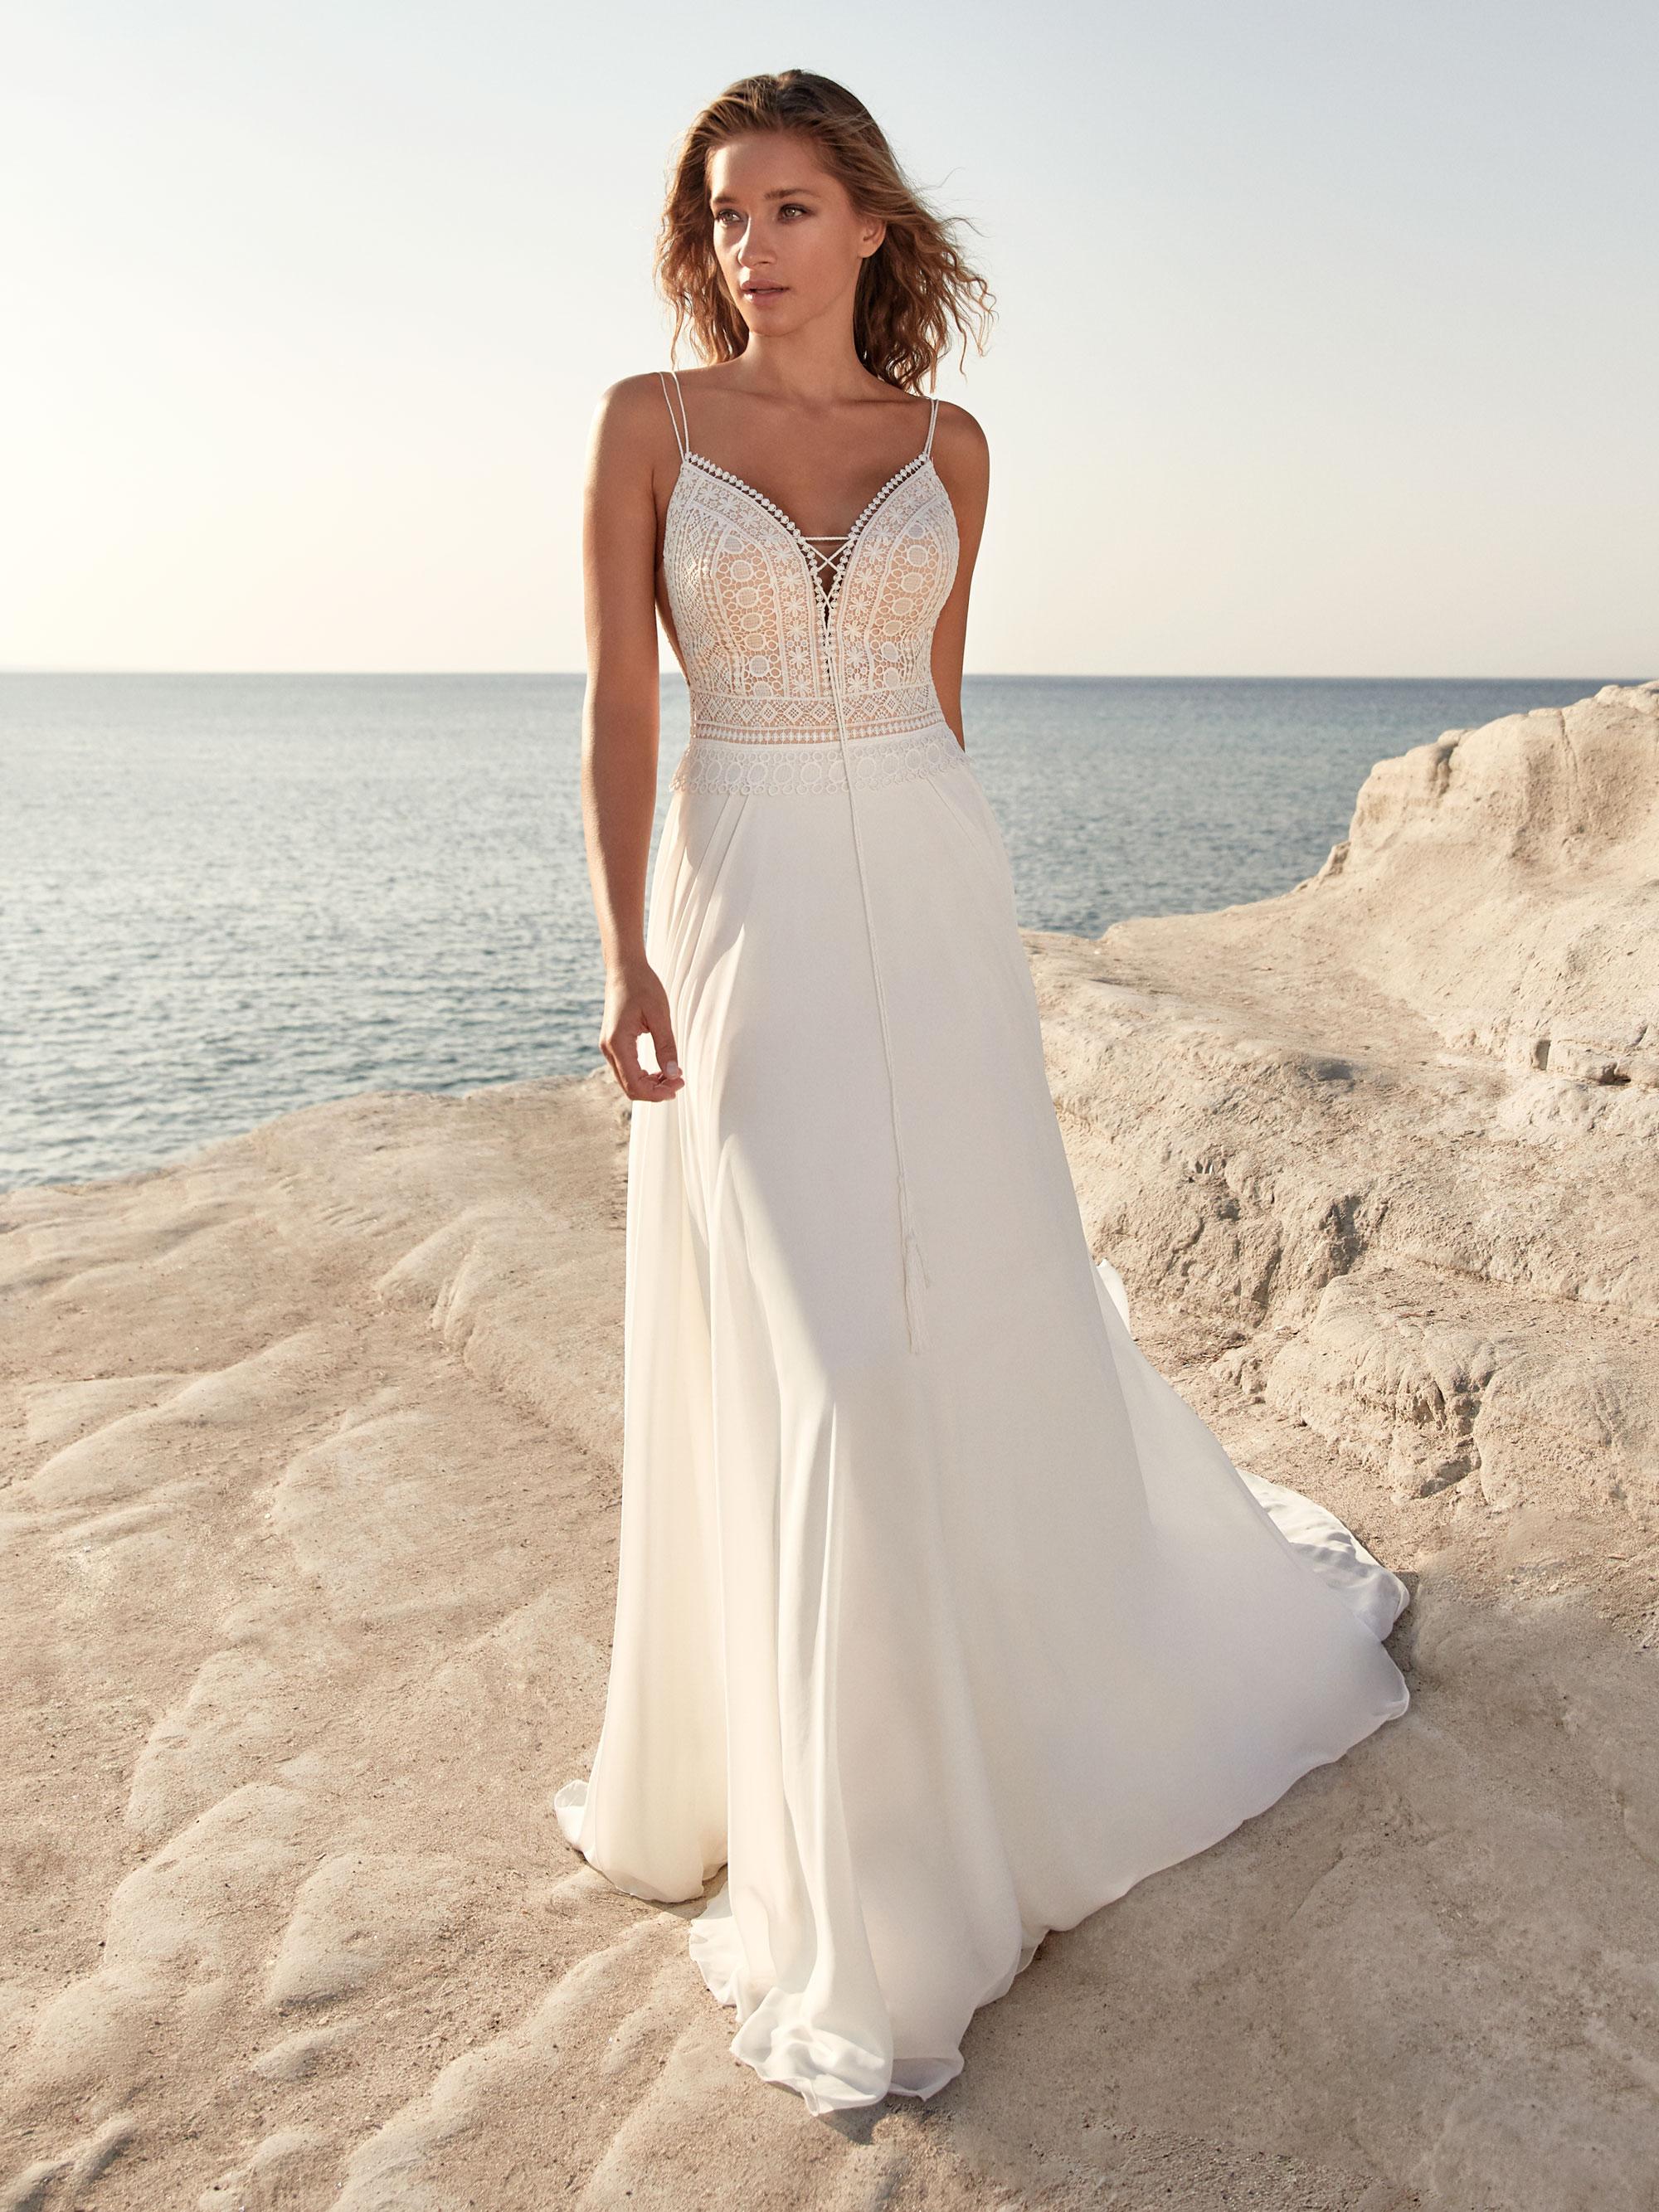 Robe de mariée fluide Thollon - White Boutik